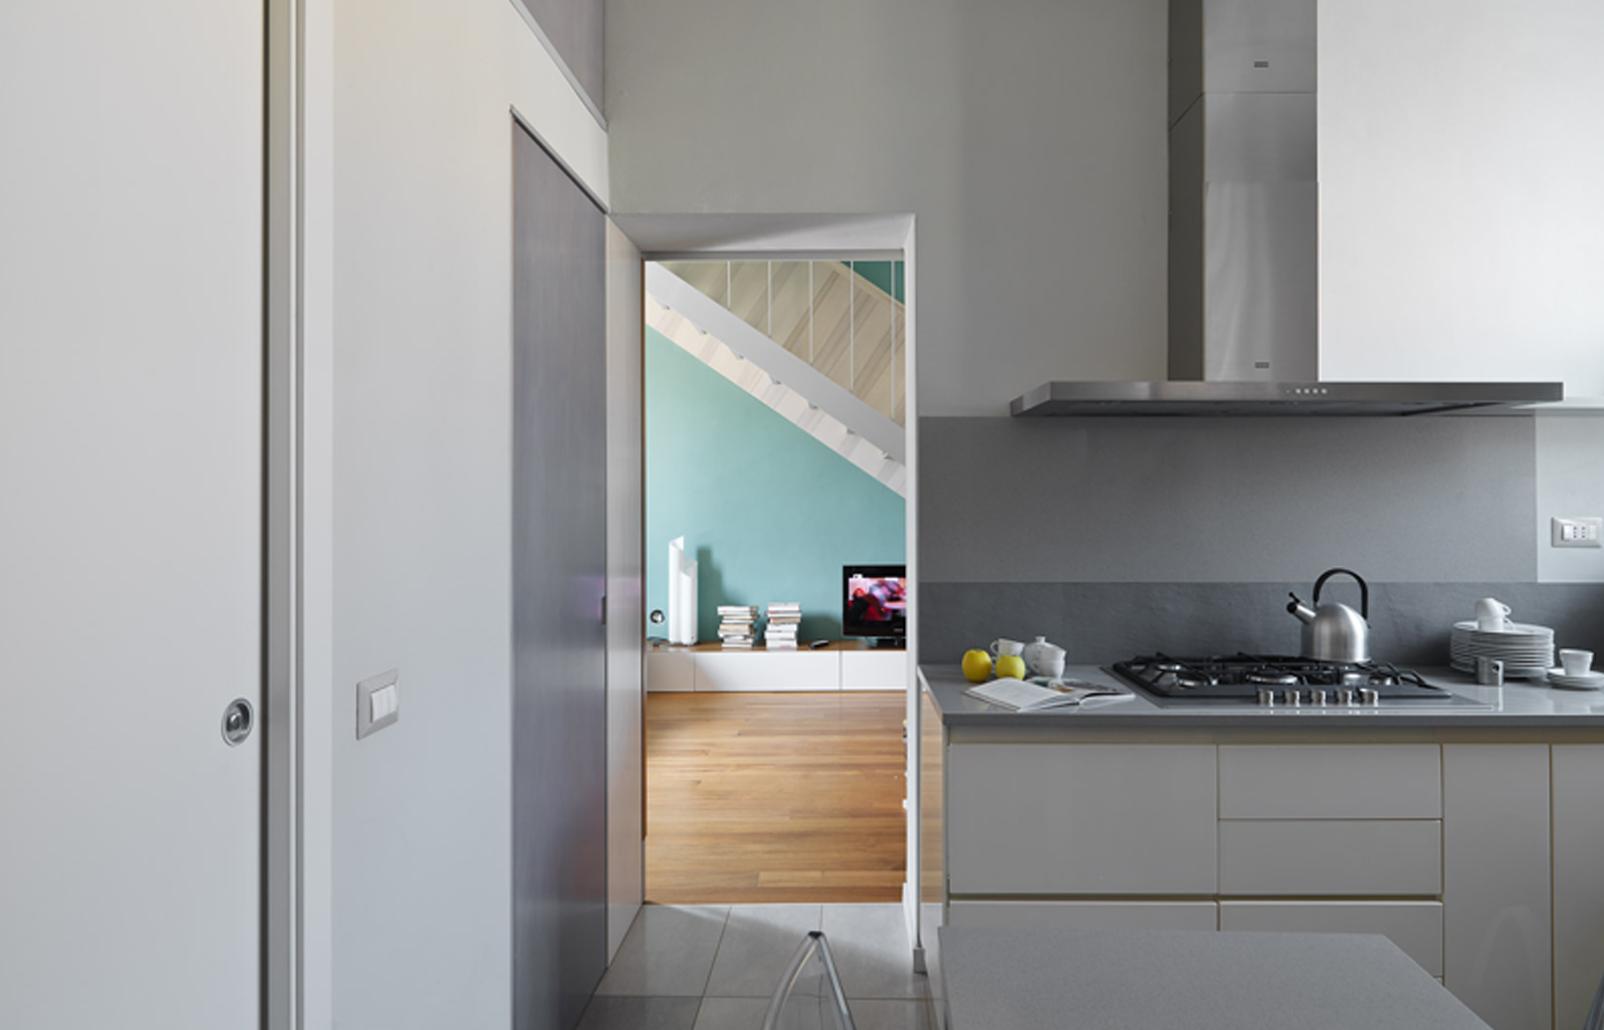 Ristrutturazioni limbiate case appartamenti impianti for Case limbiate